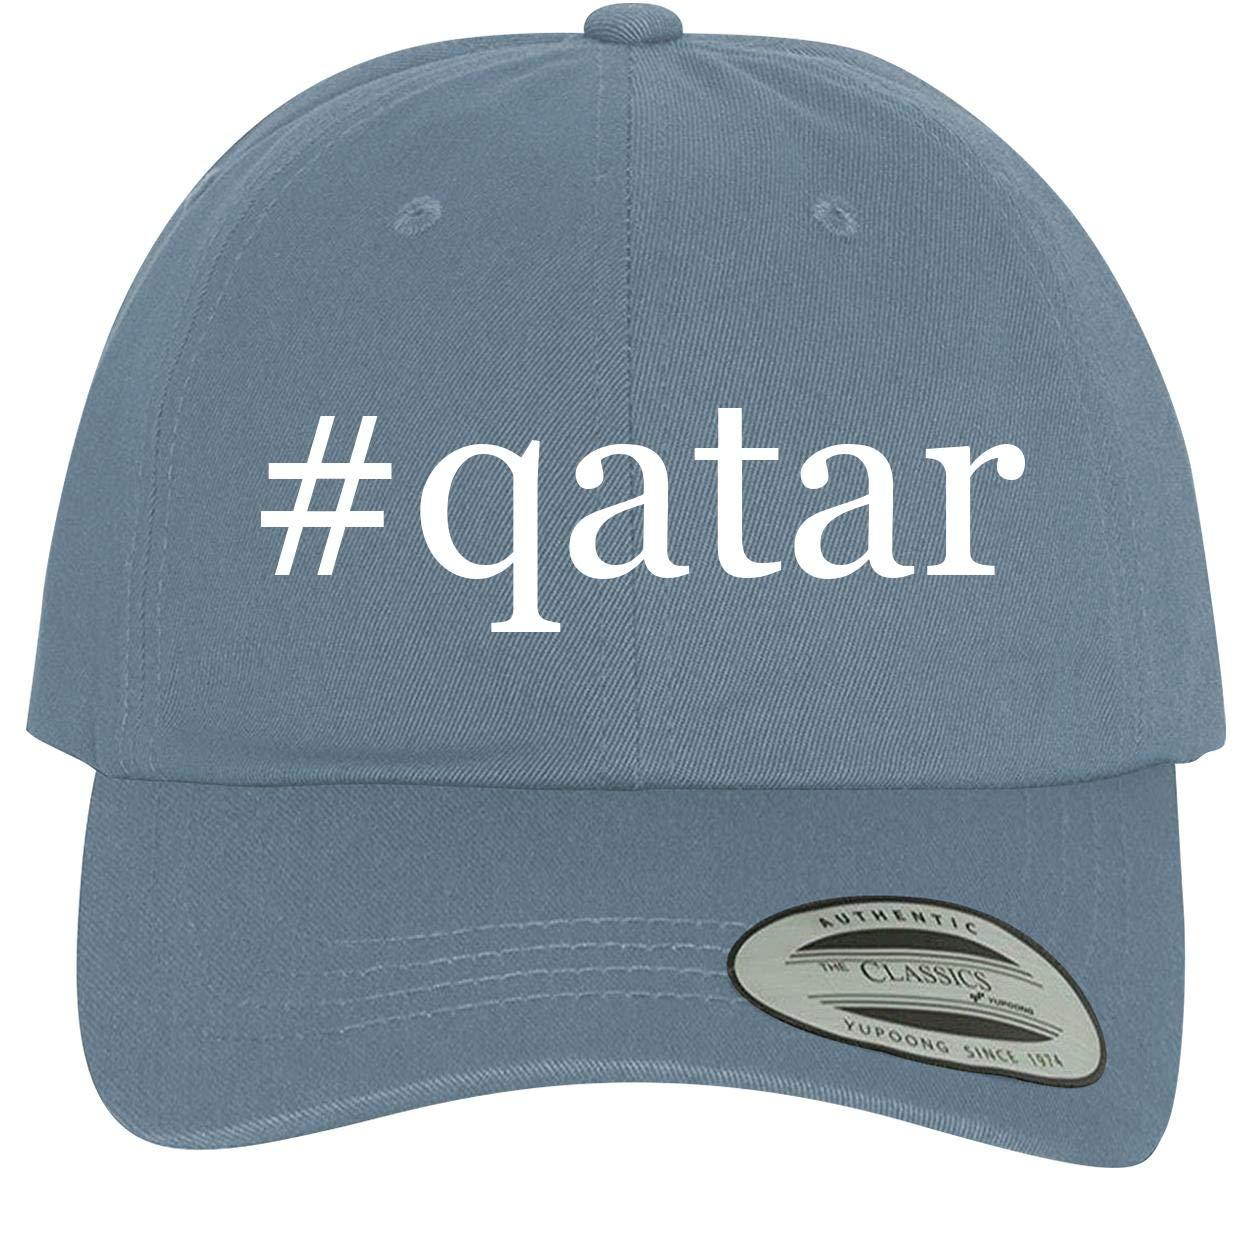 BH Cool Designs #Qatar Comfortable Dad Hat Baseball Cap